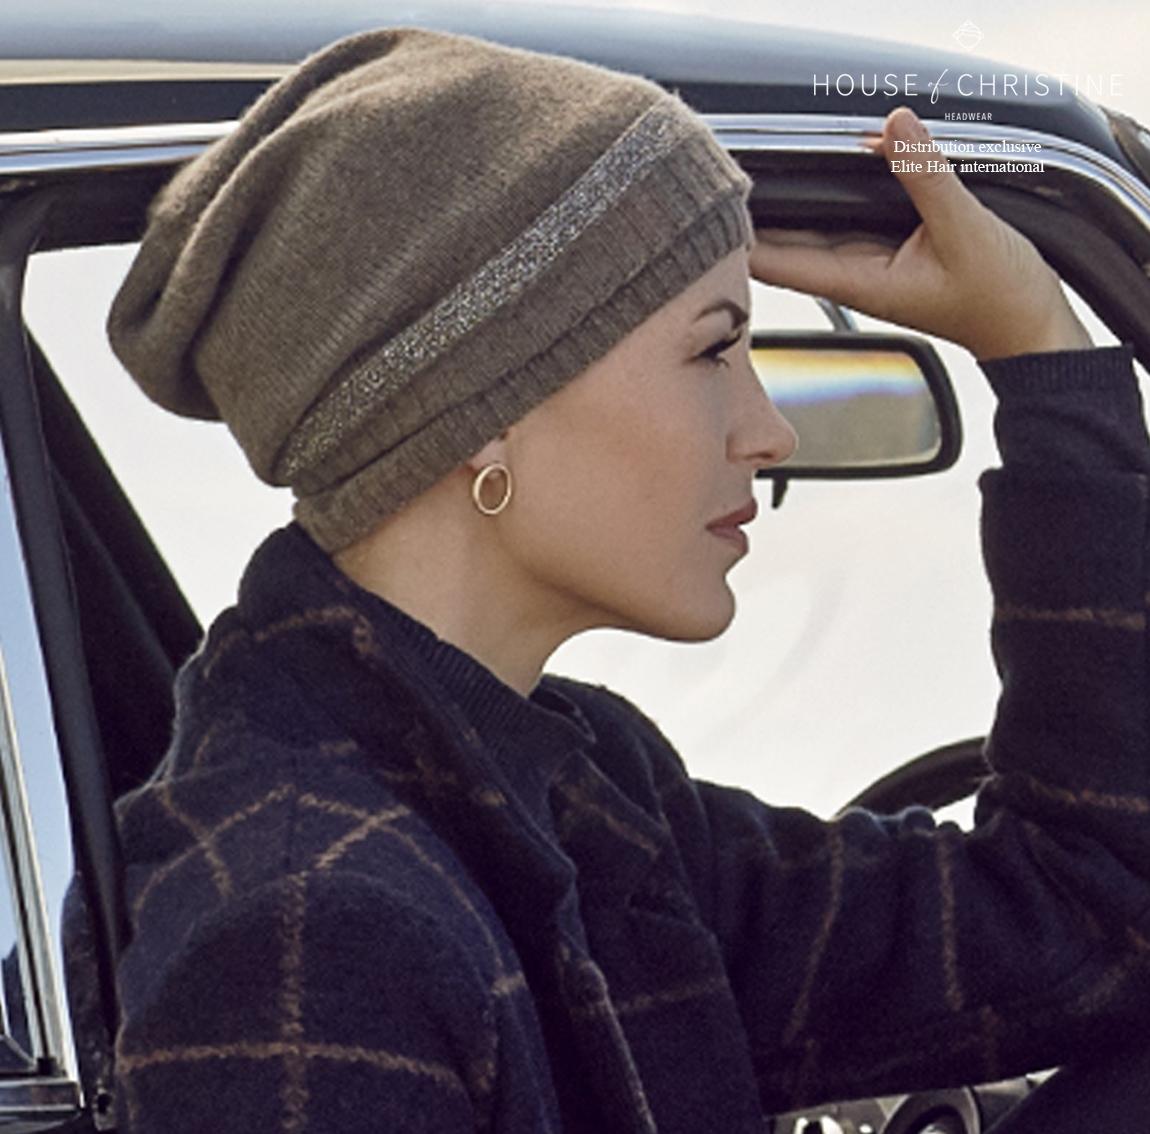 Bonnet cachemire, bonnet chimio cachemire, bonnet chimio hiver, amande, christine headwear